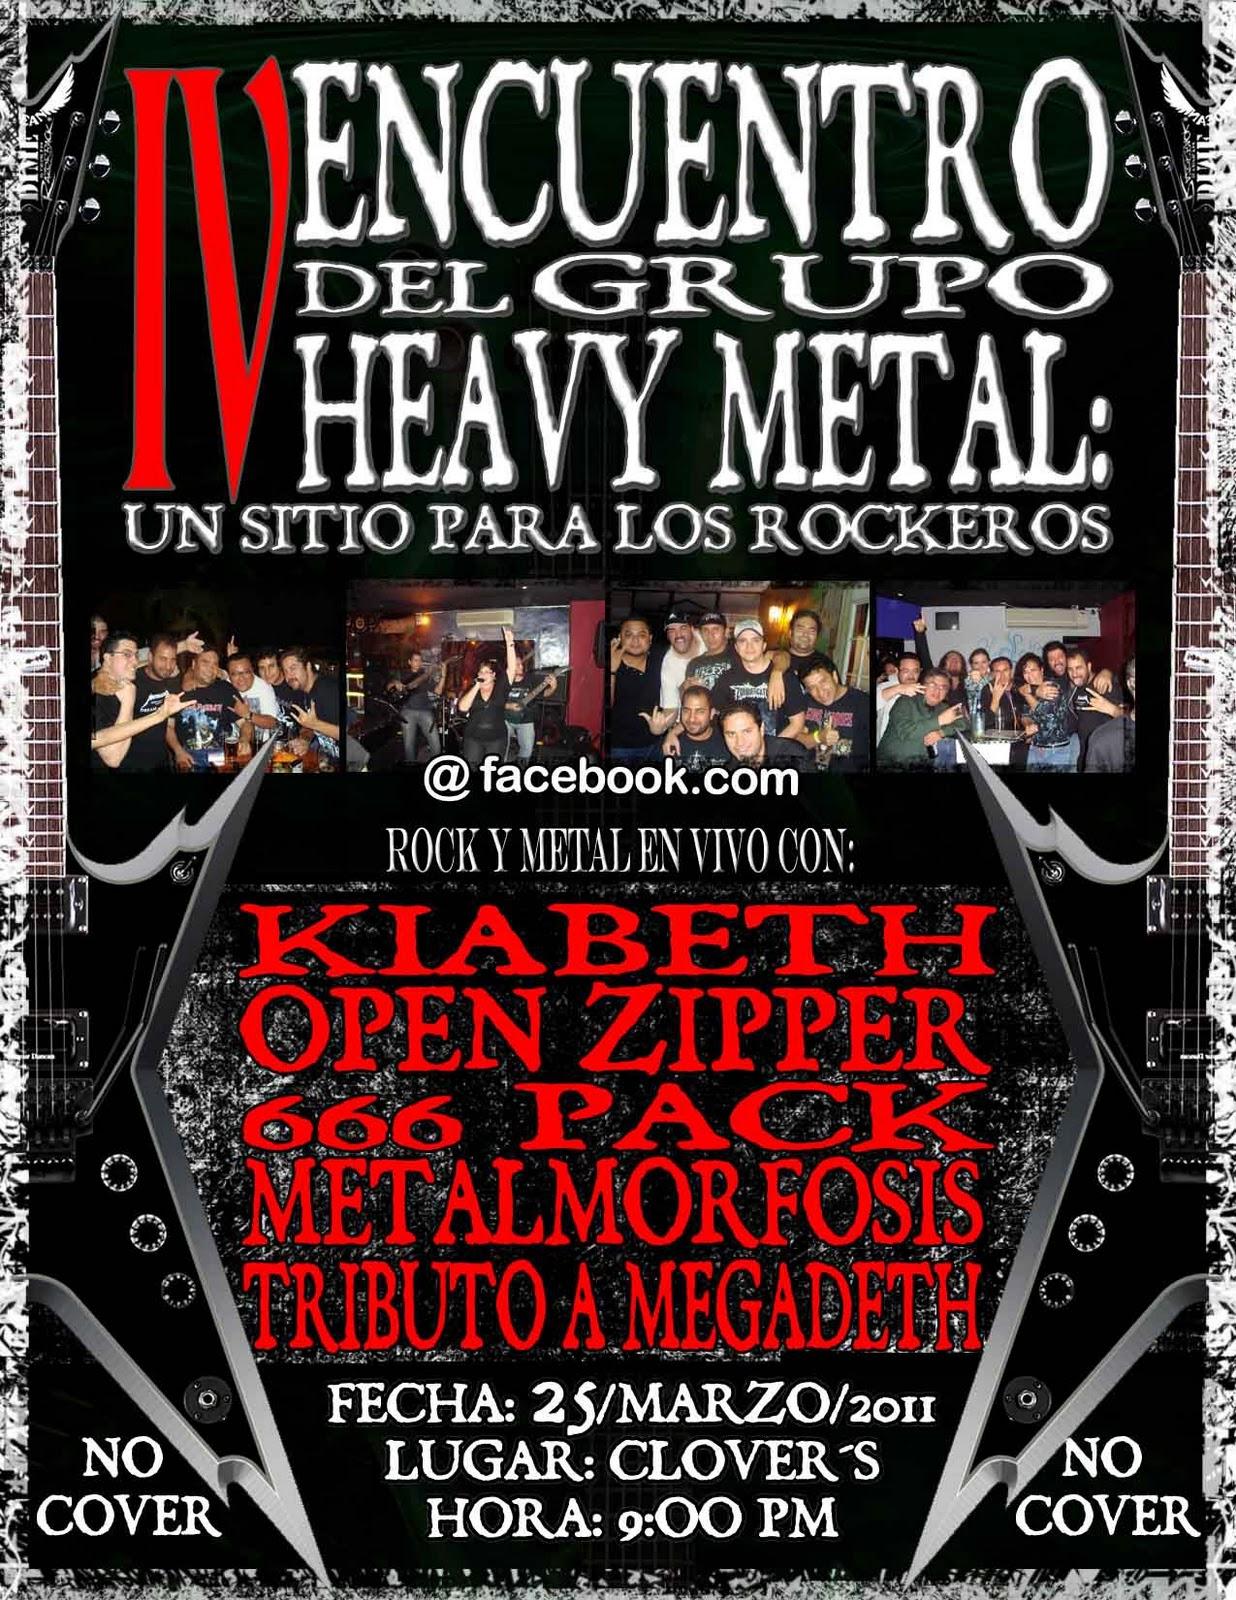 grupo de heavy metal espanol: